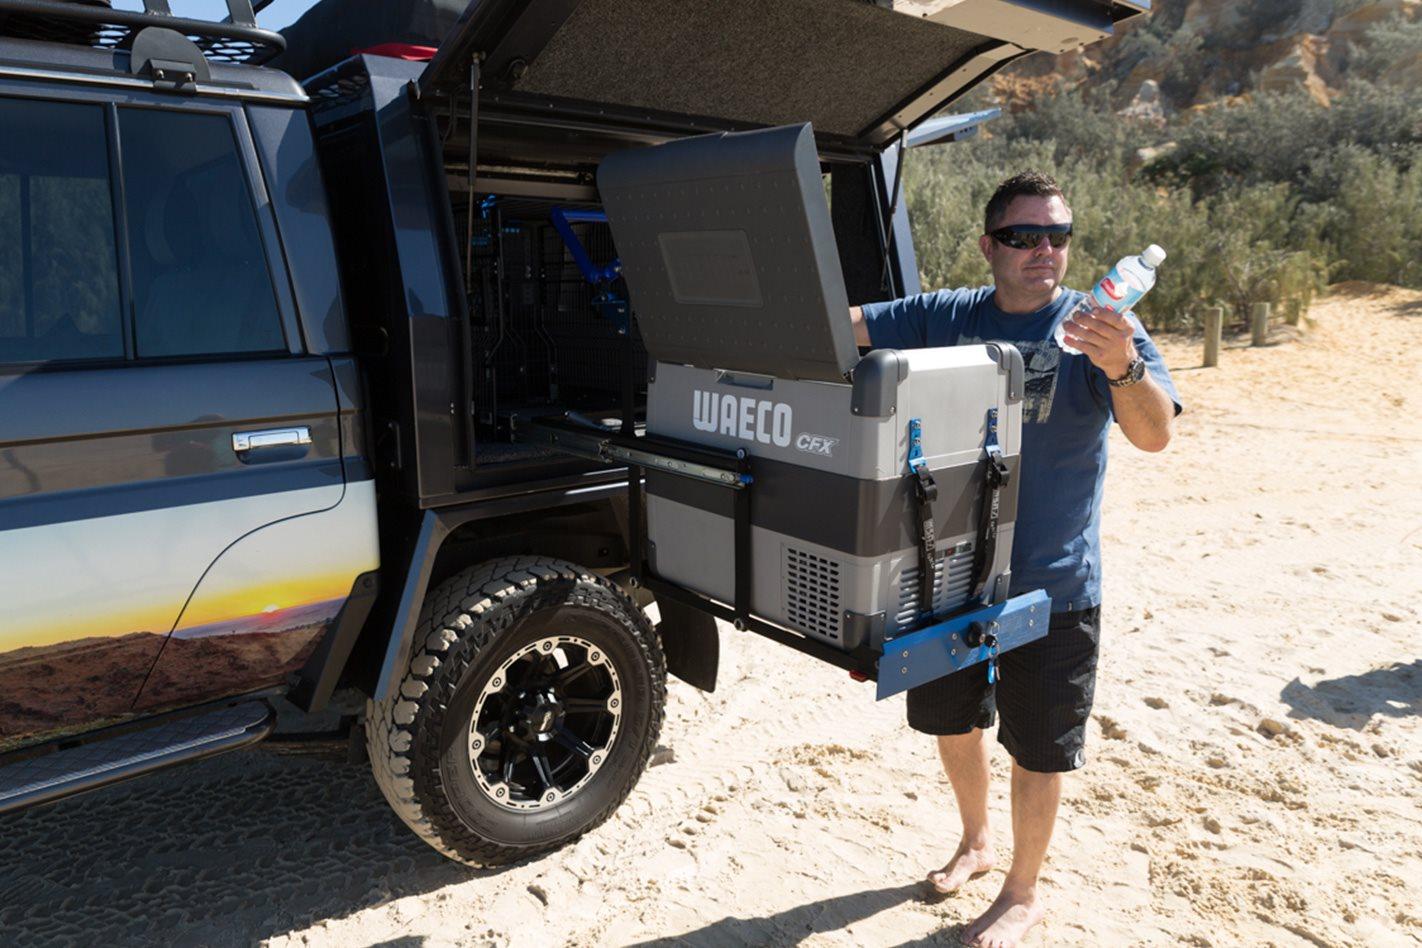 MSA 4X4 Accessories' Explorer Aluminium Drawer System with Waeco fridge